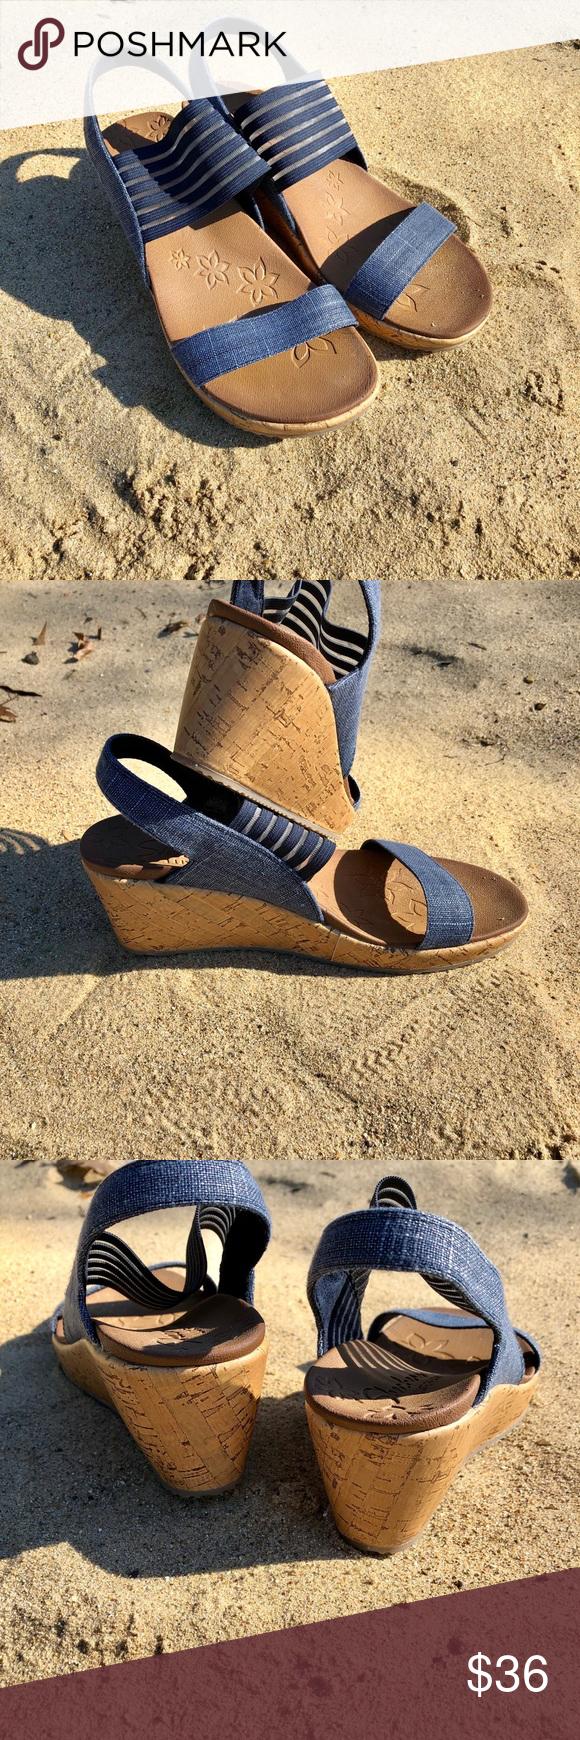 Skechers Beverley Smitten Kitten Wedge Sandal Soft Linen And Stretch Fabric Upper Strappy Comfort Sandal Wedge 2 1 4 Wedge Sandals Sandals Comfortable Sandals